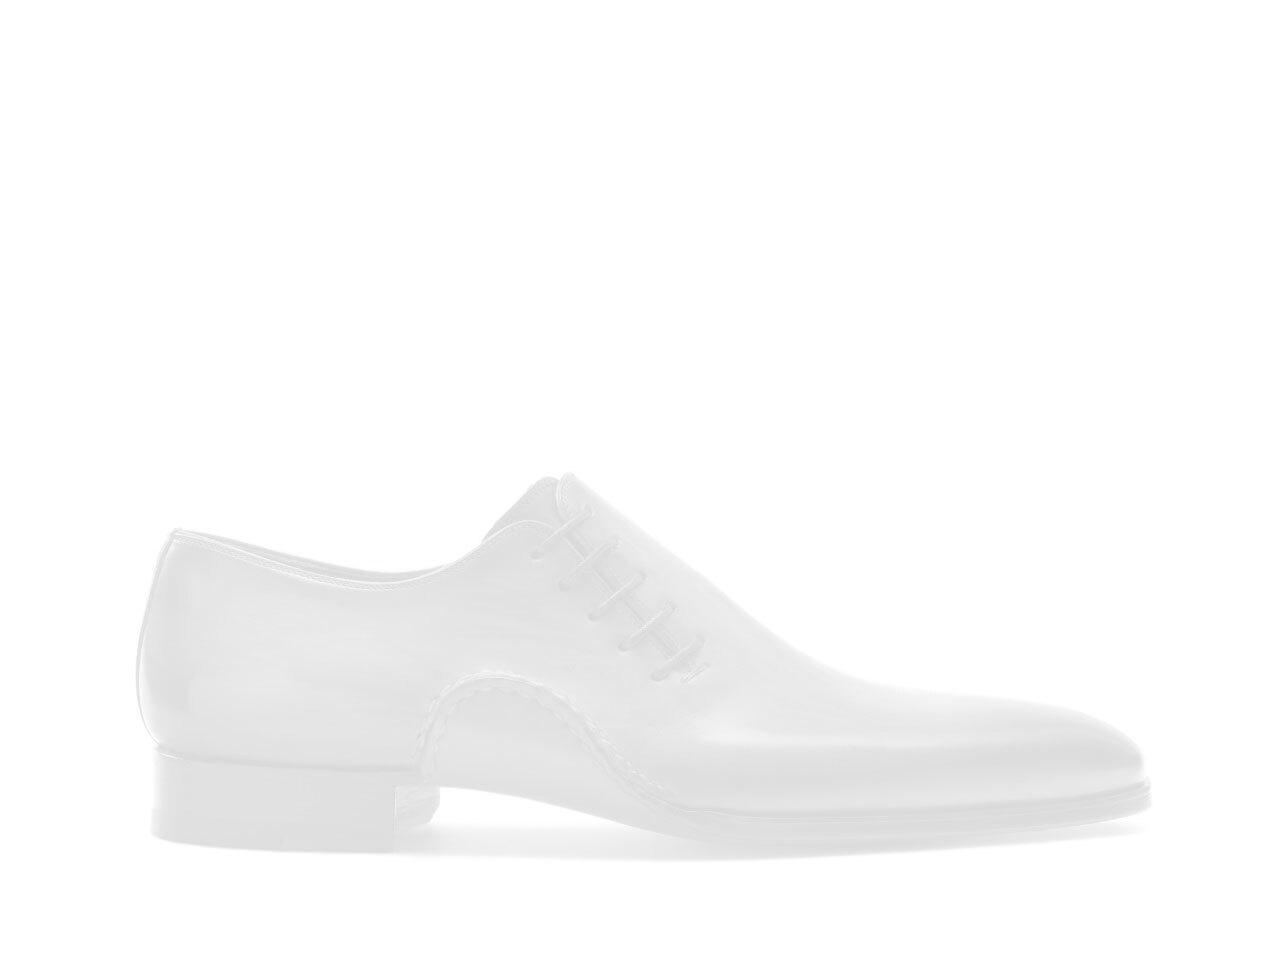 Side view of the Magnanni Camarena Cuero Men's Sneakers